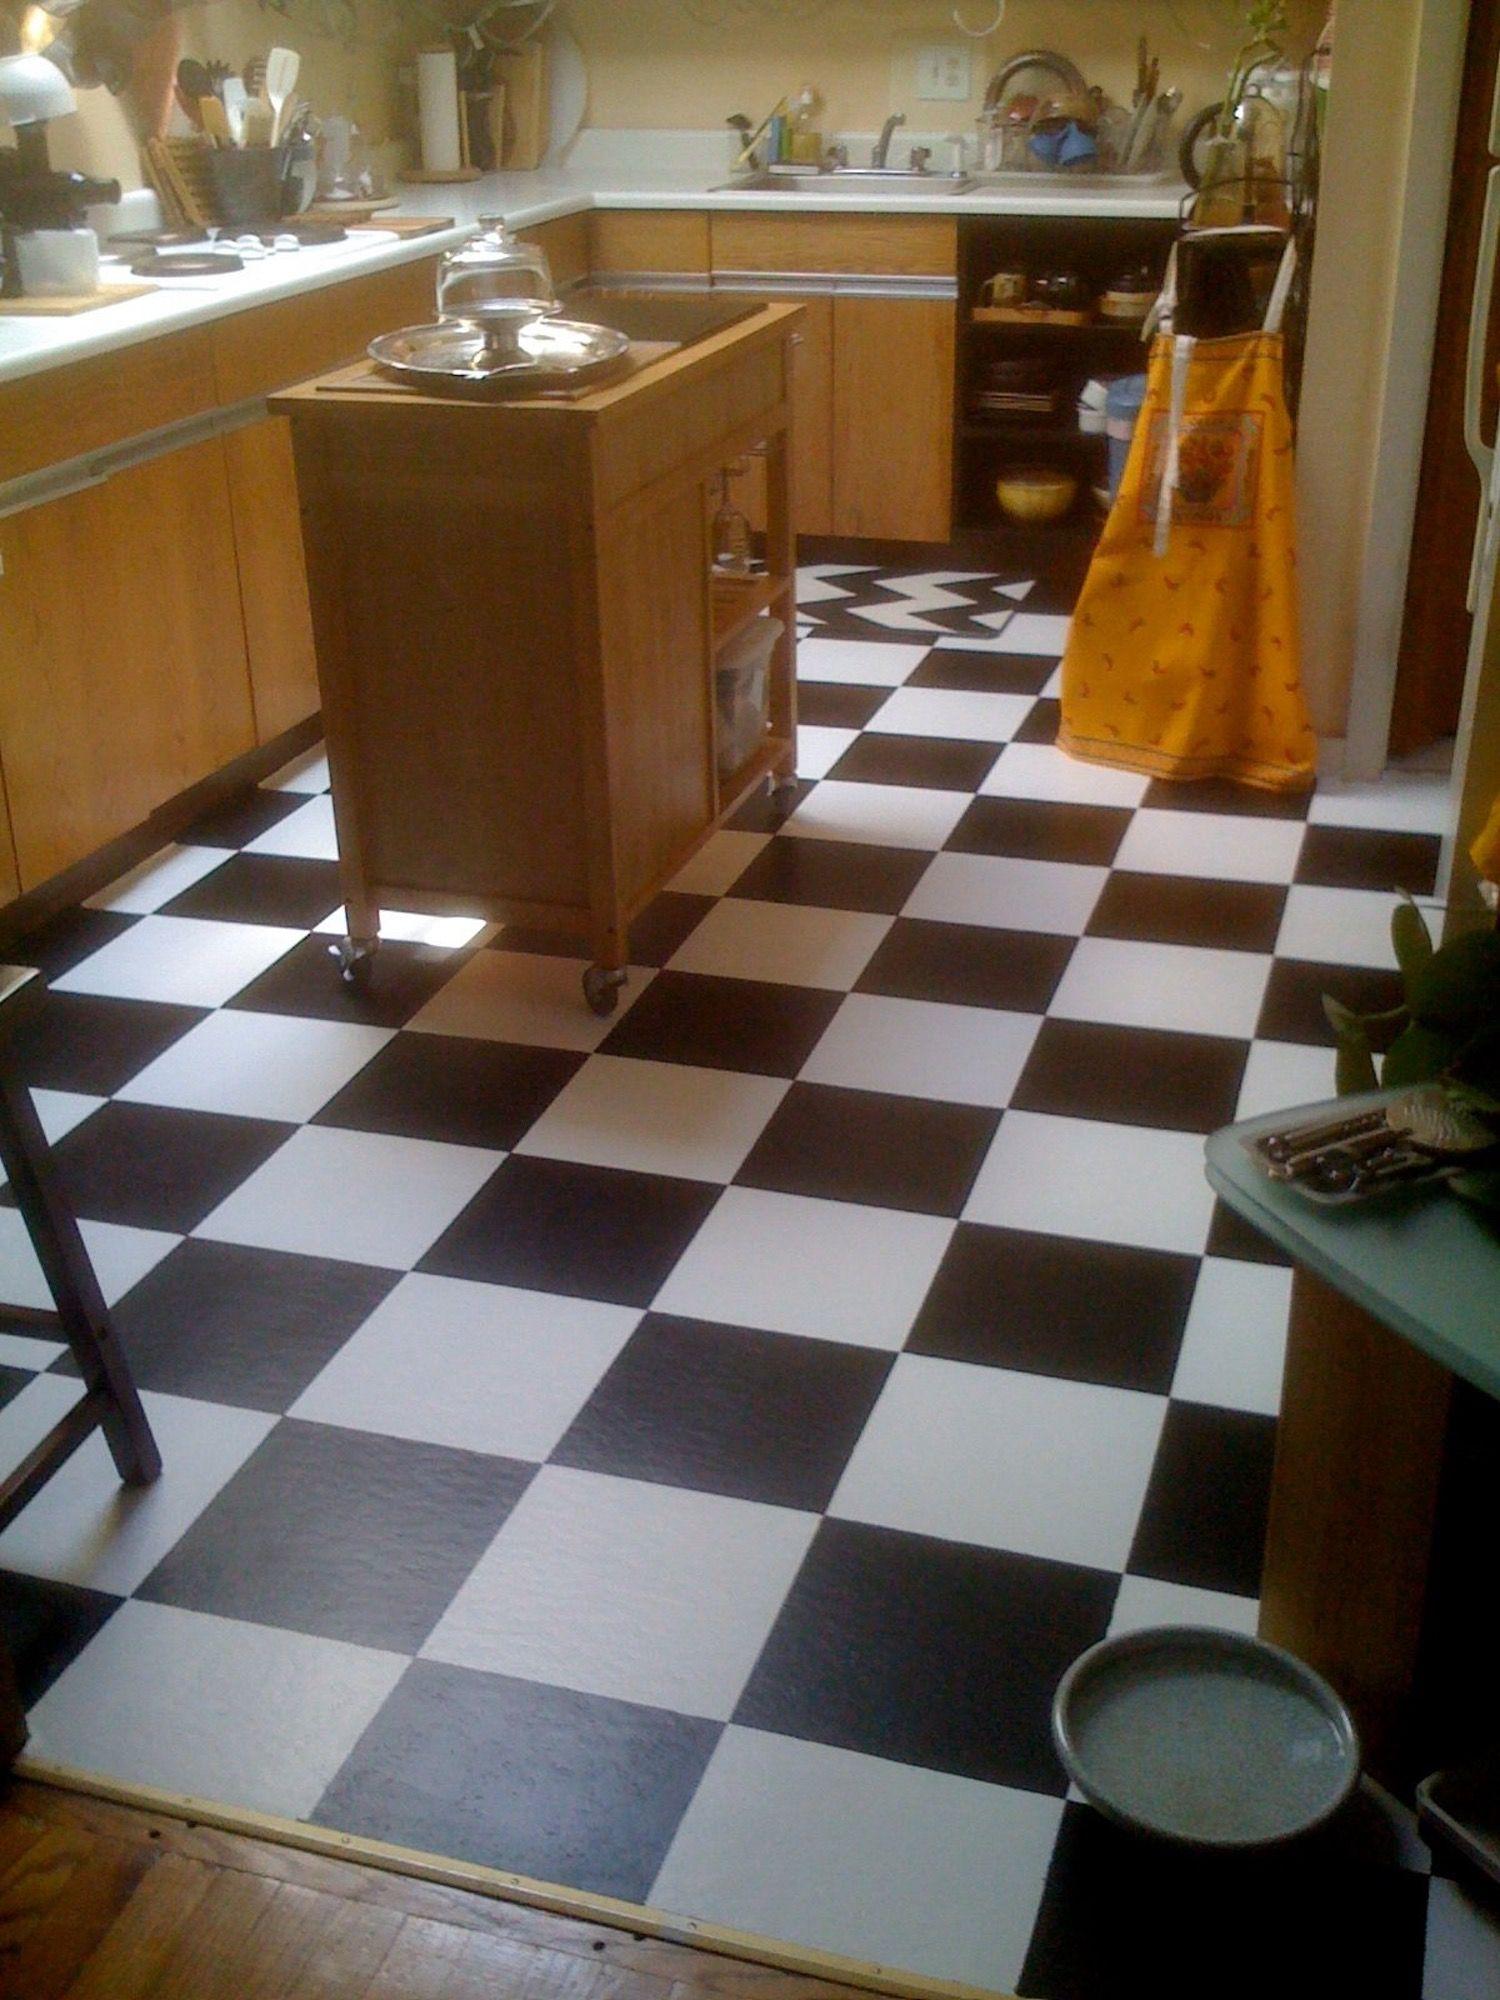 Diy room decor how to paint over vinyl floor tiles apartment diy room decor how to paint over vinyl floor tiles apartment therapy tutorials doublecrazyfo Choice Image